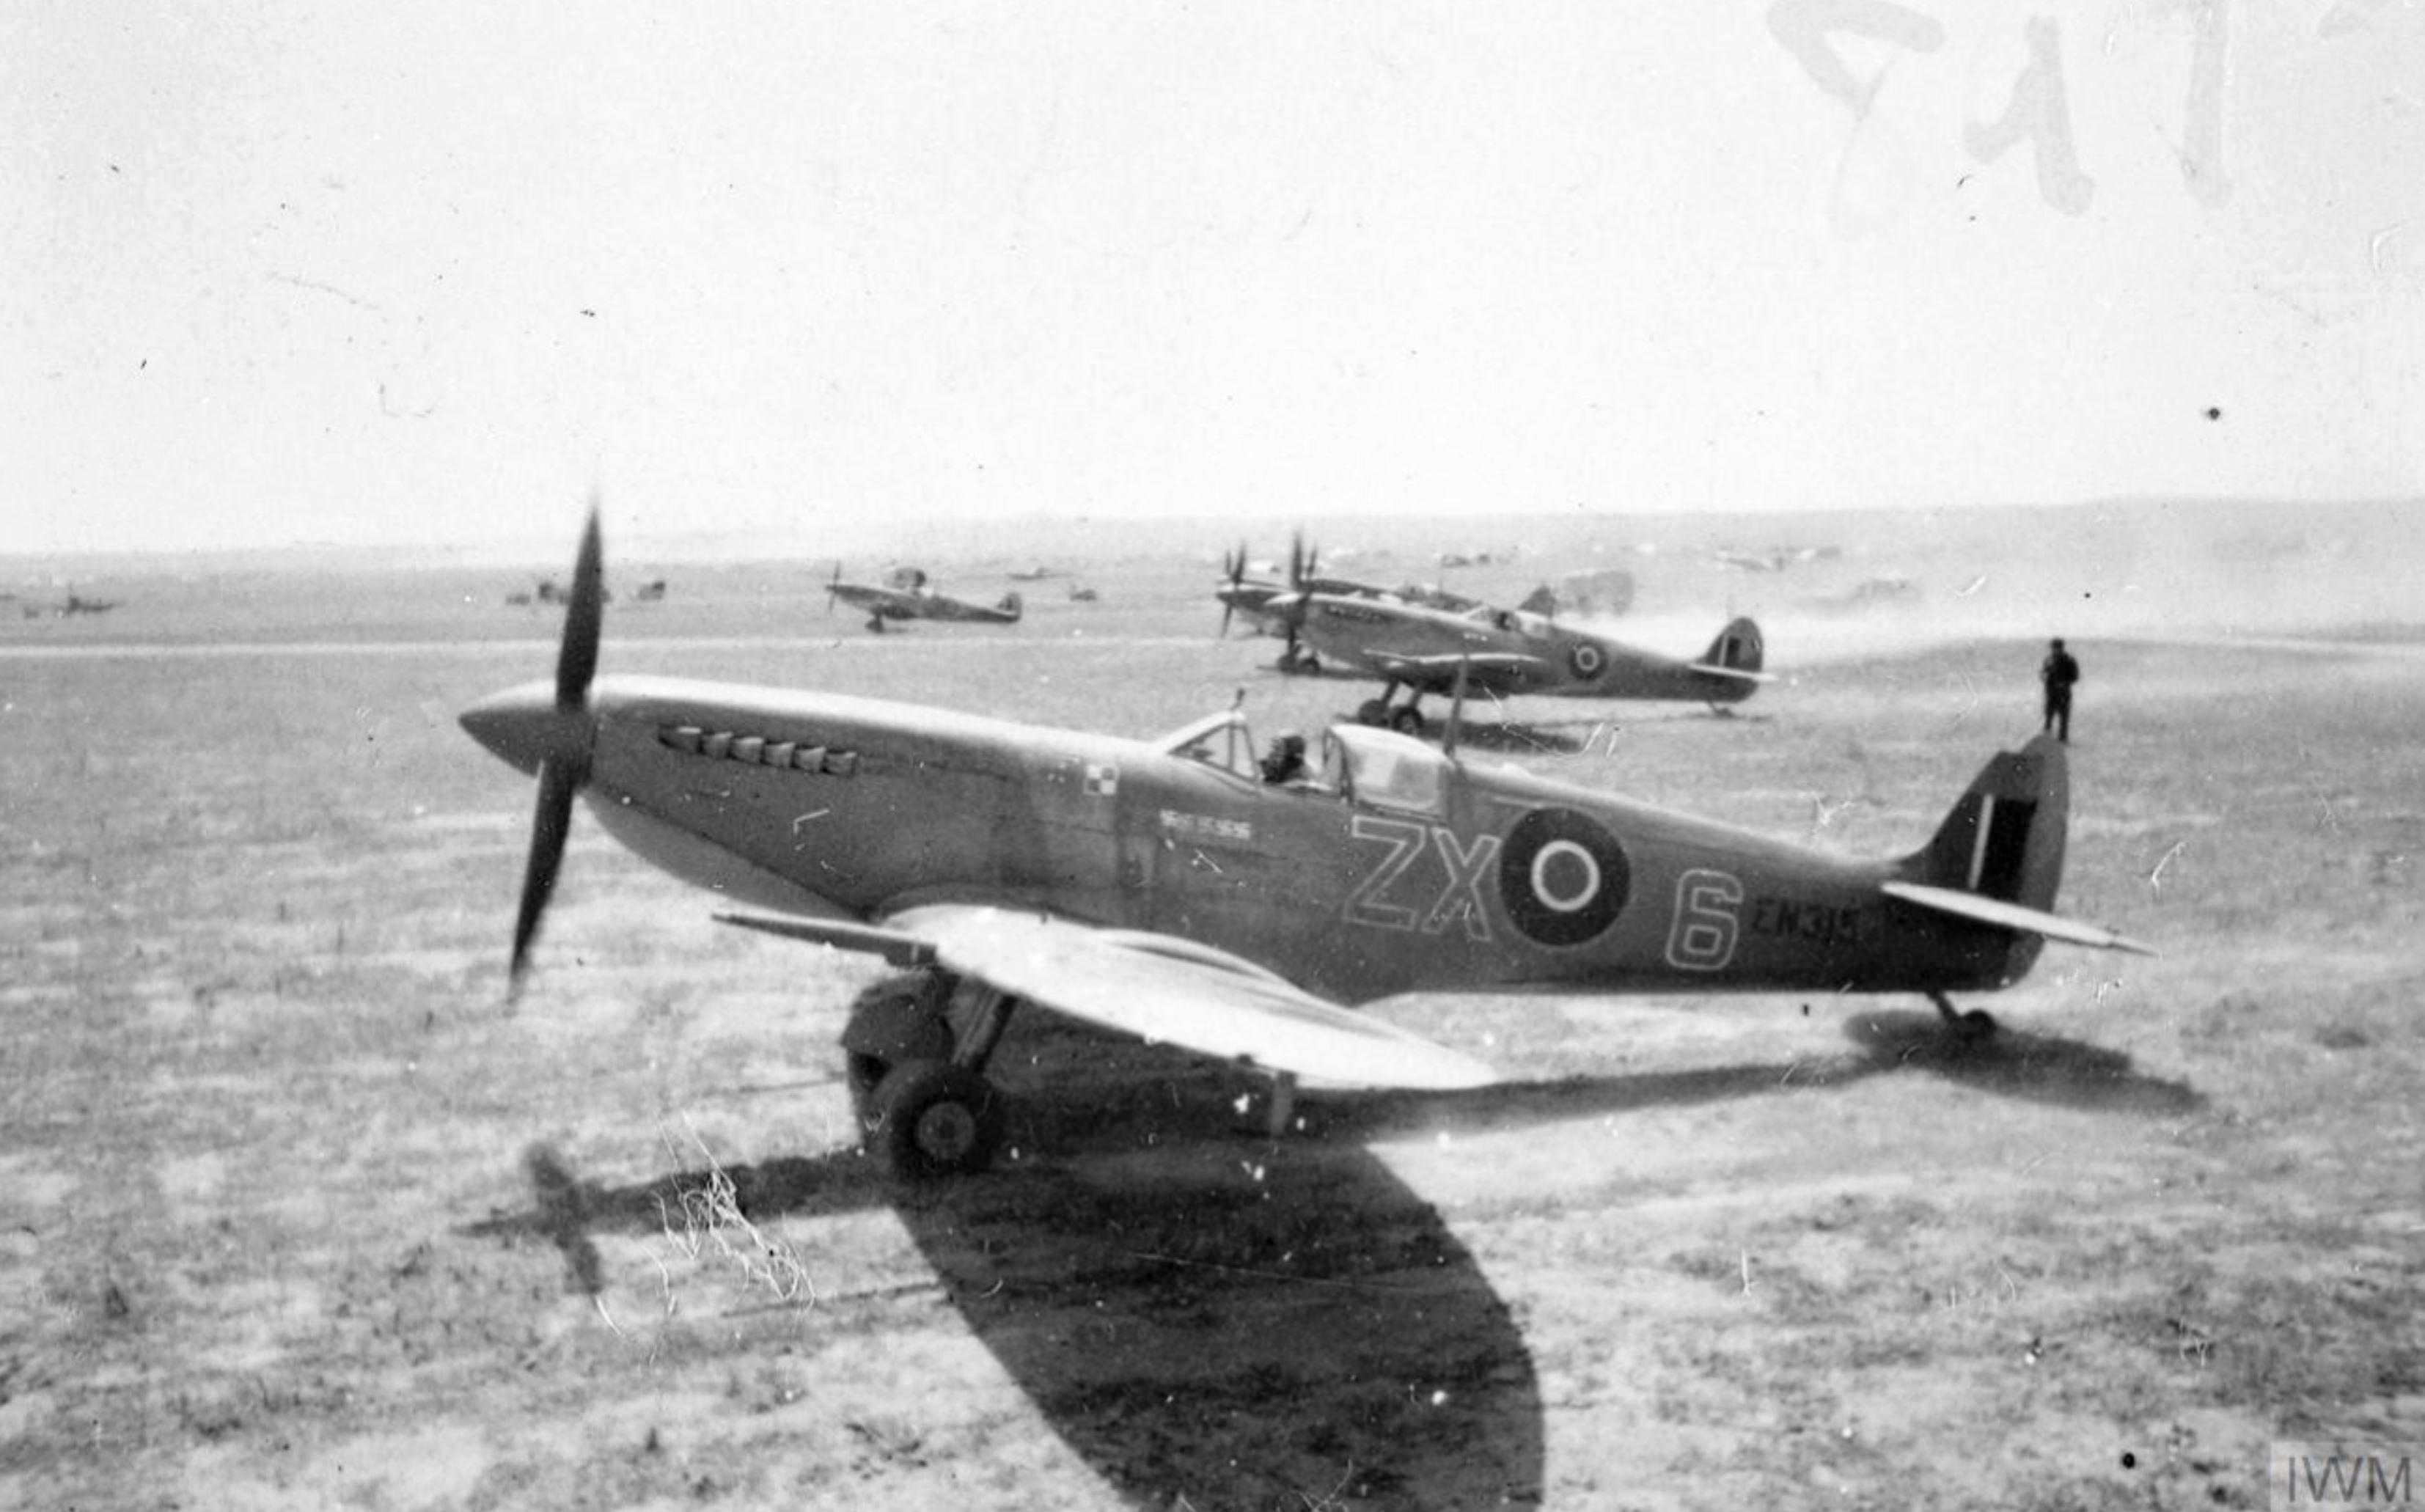 Spitfire MkIXc RAF 145Sqn ZX6 EN315 Stanislaw Skalski and EN261 dispersal area at Tunisia Apr 1943 IWM CNA4542